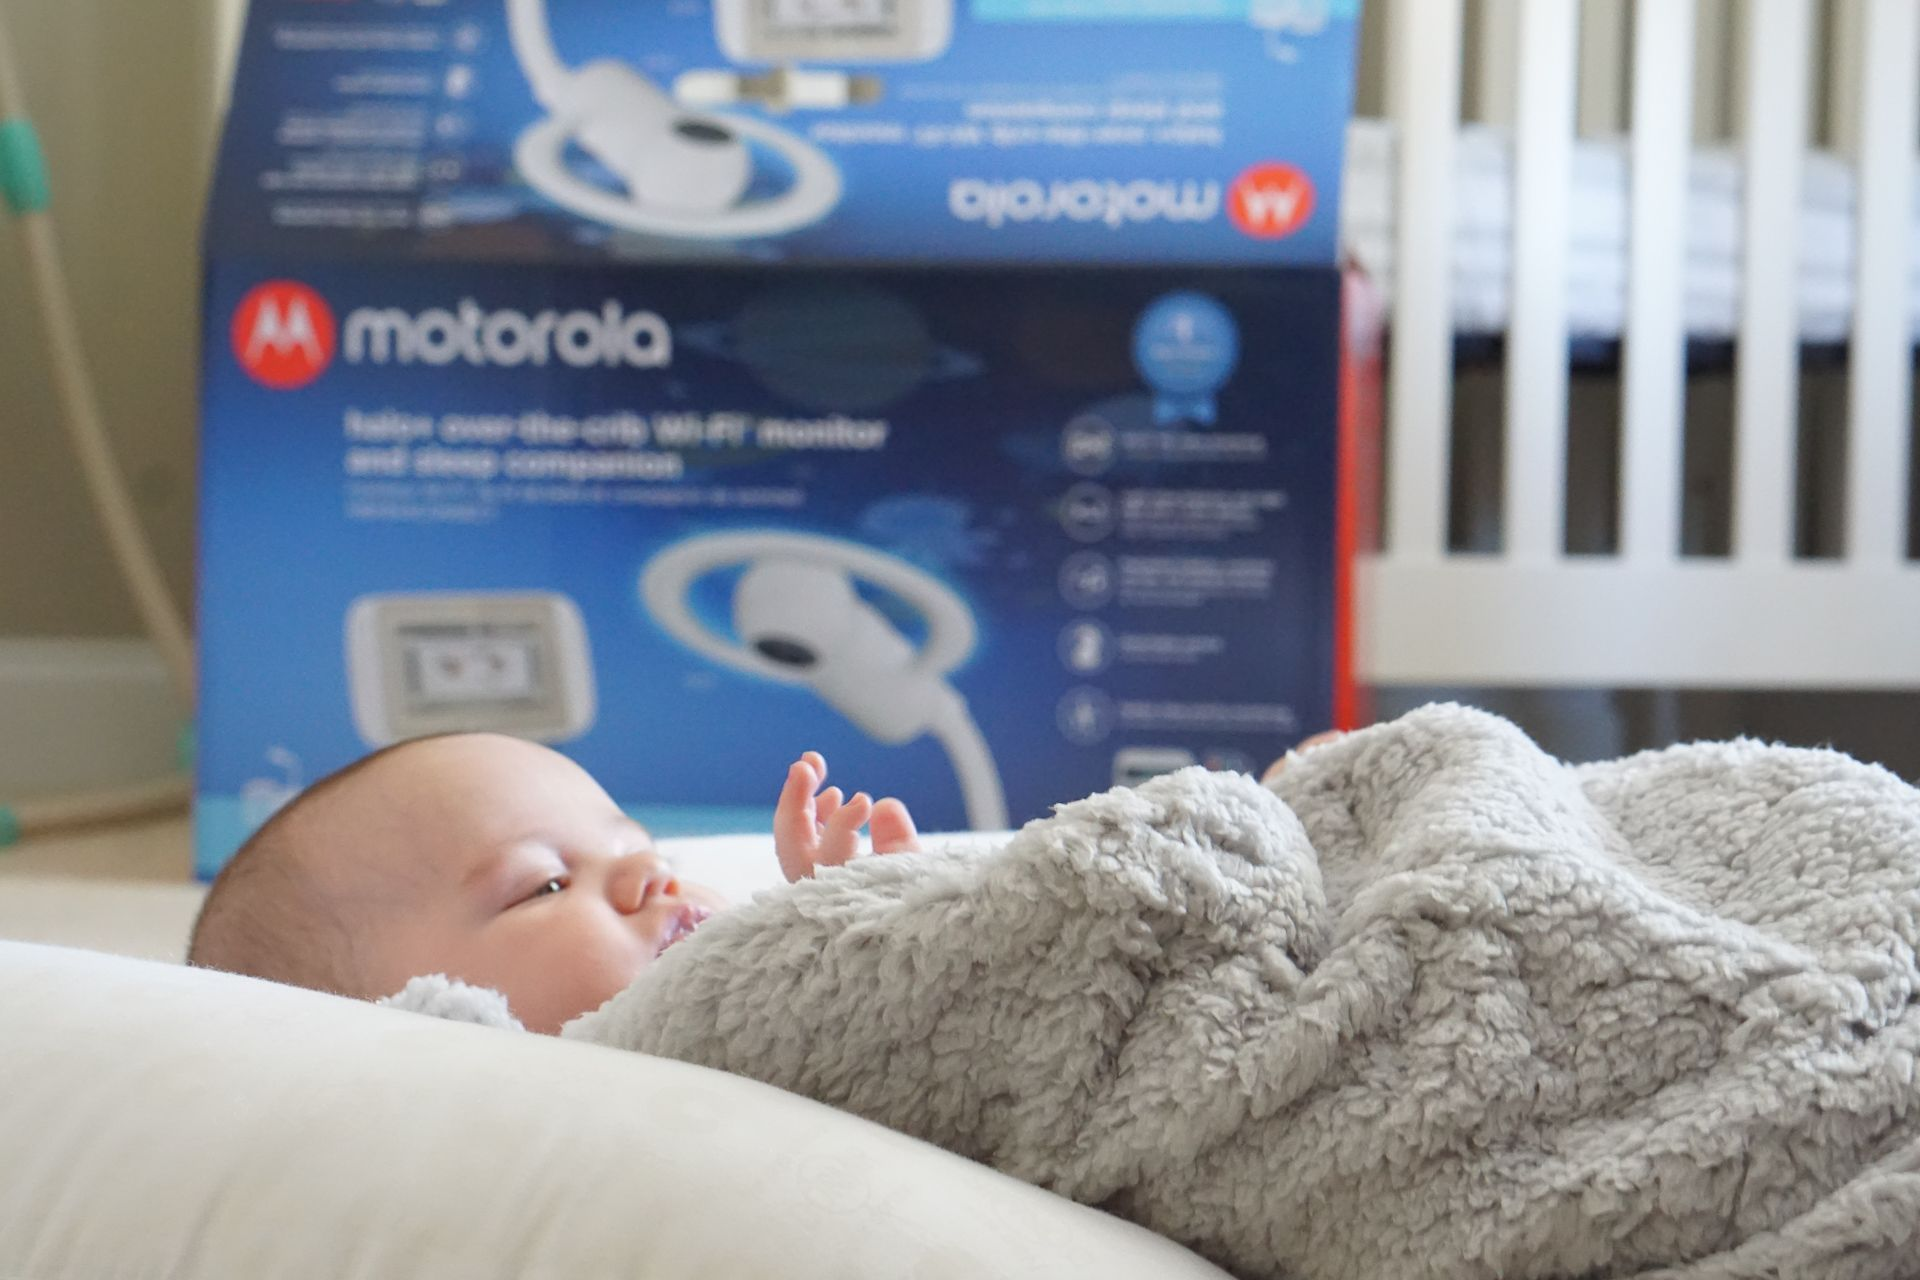 motorola halo baby monitor app